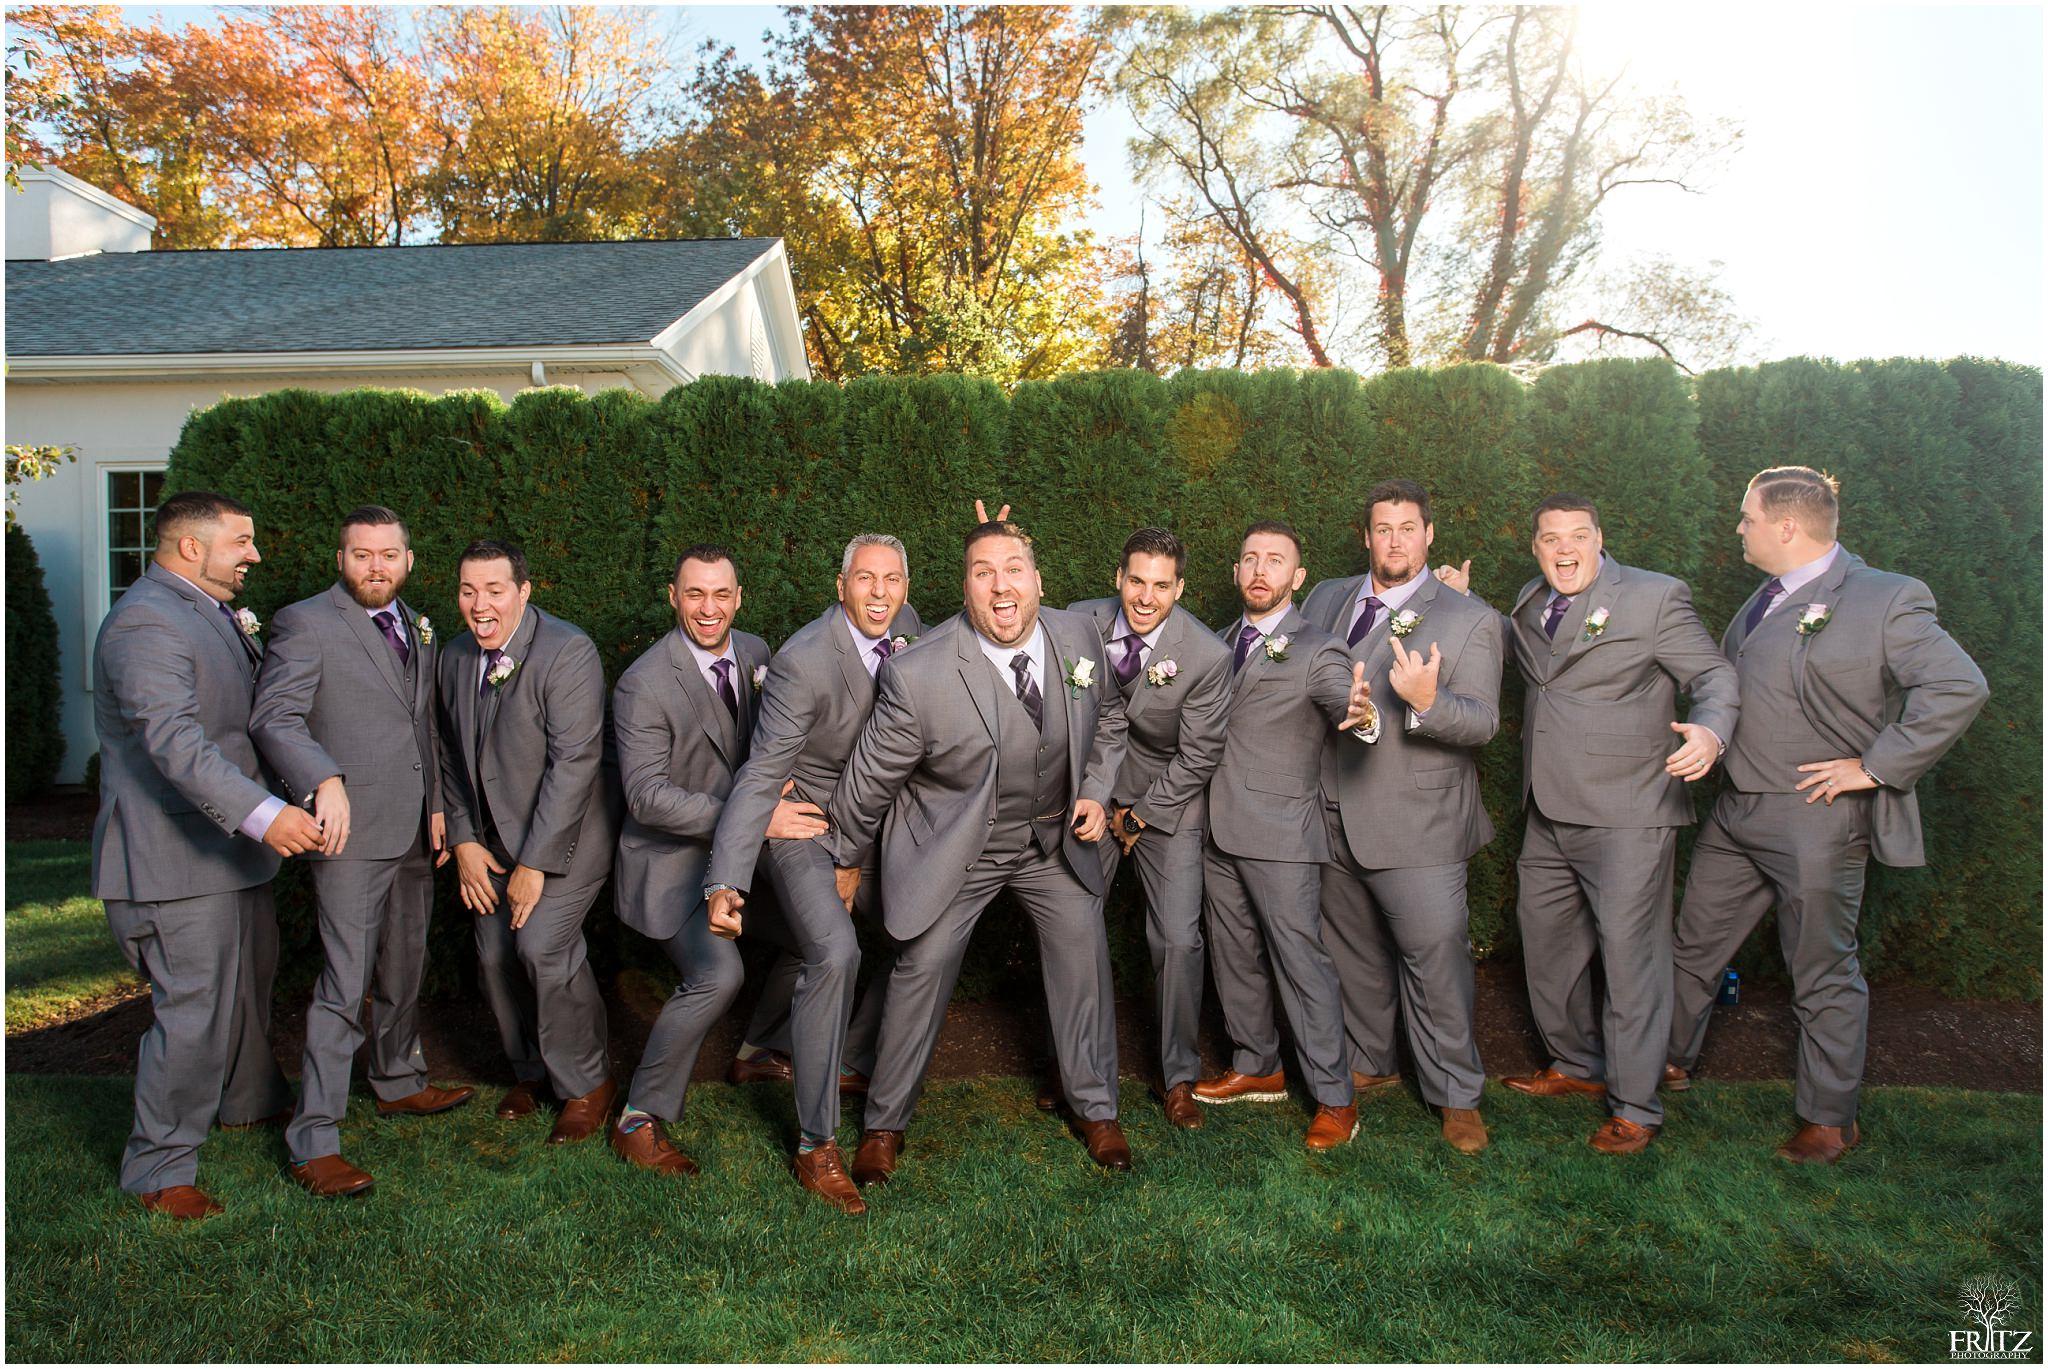 Candlewood inn wedding 5 fritz photography candlewood inn wedding 5 junglespirit Image collections